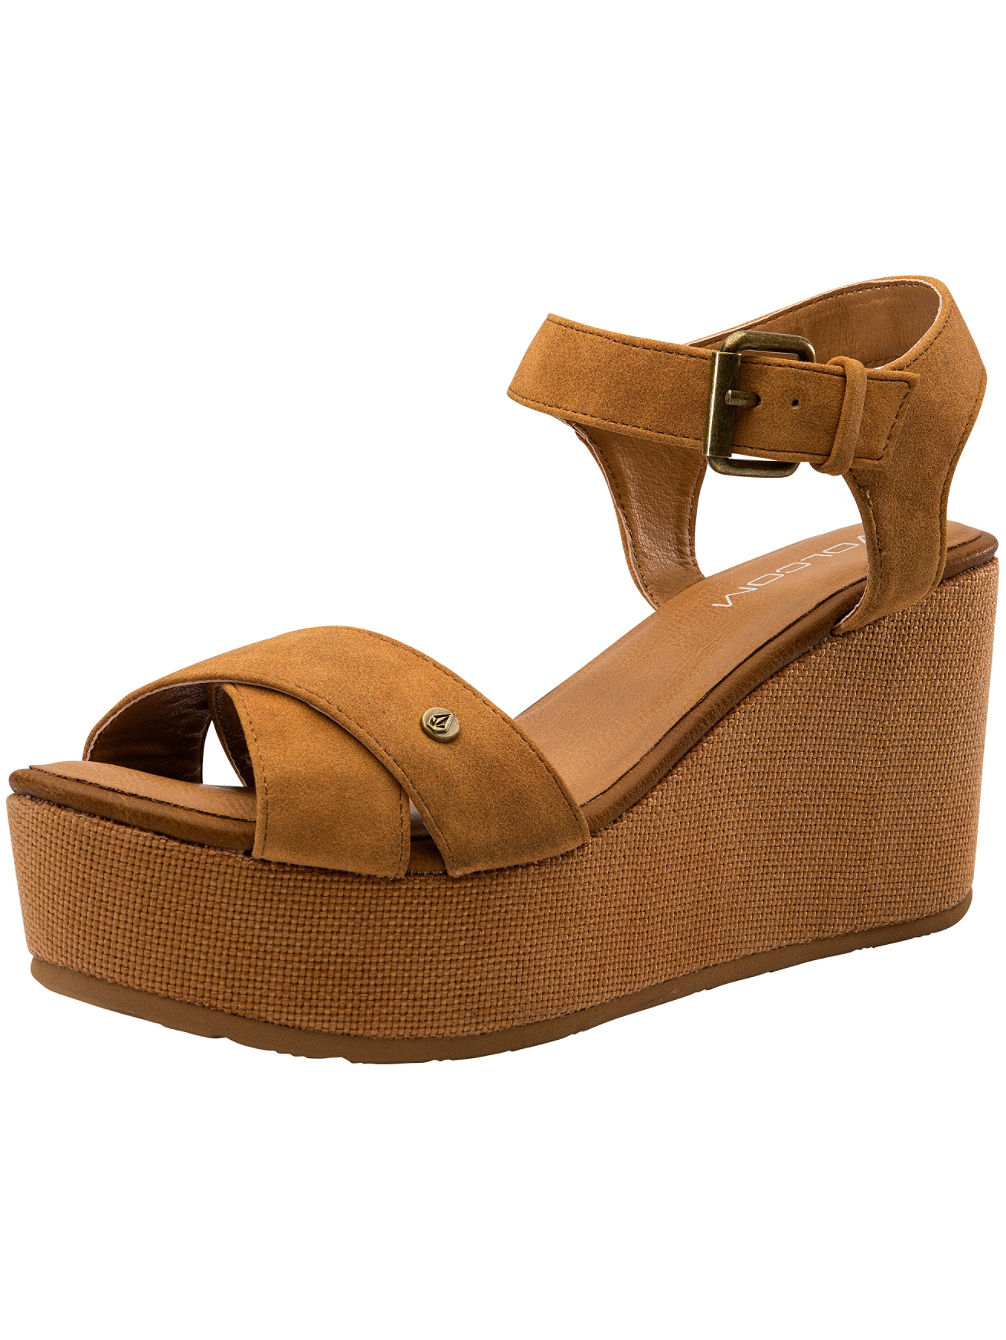 728b2ab8d5d Buy Volcom Stone Platform Sandals Women online at blue-tomato.com